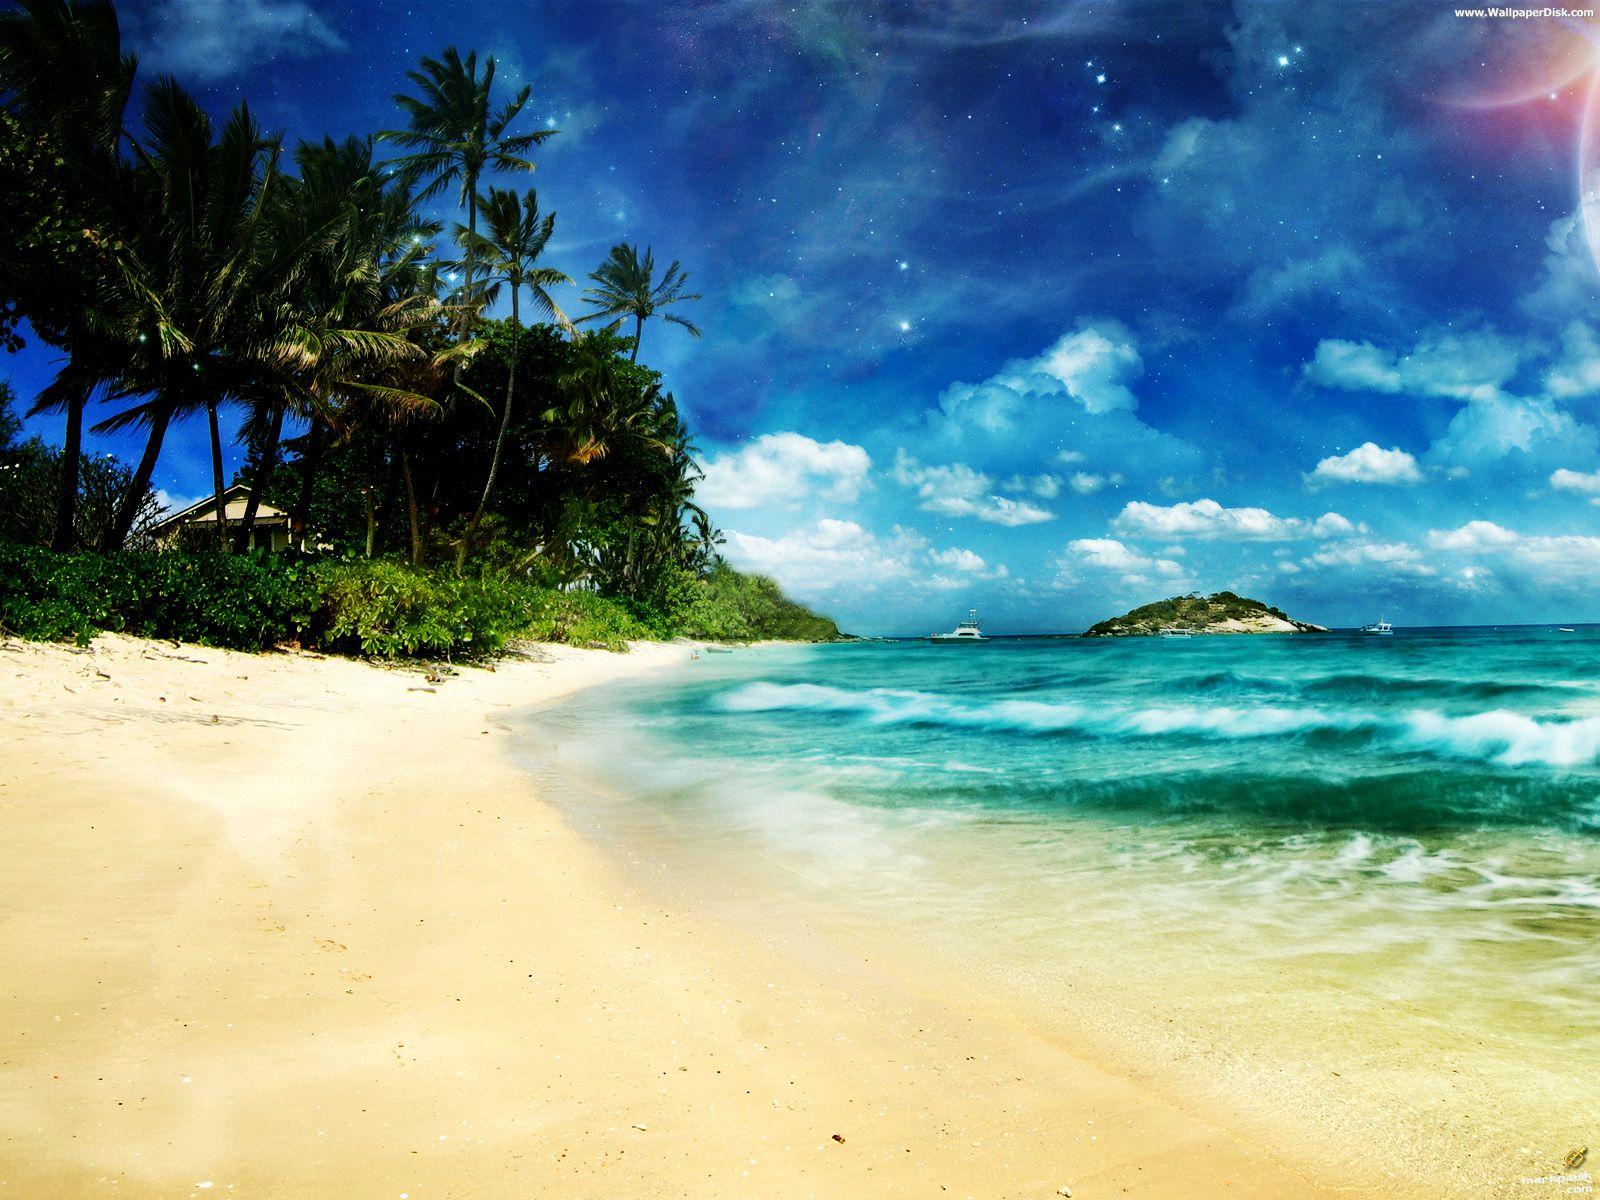 Pin Ocean Scenes Wallpaper on Pinterest